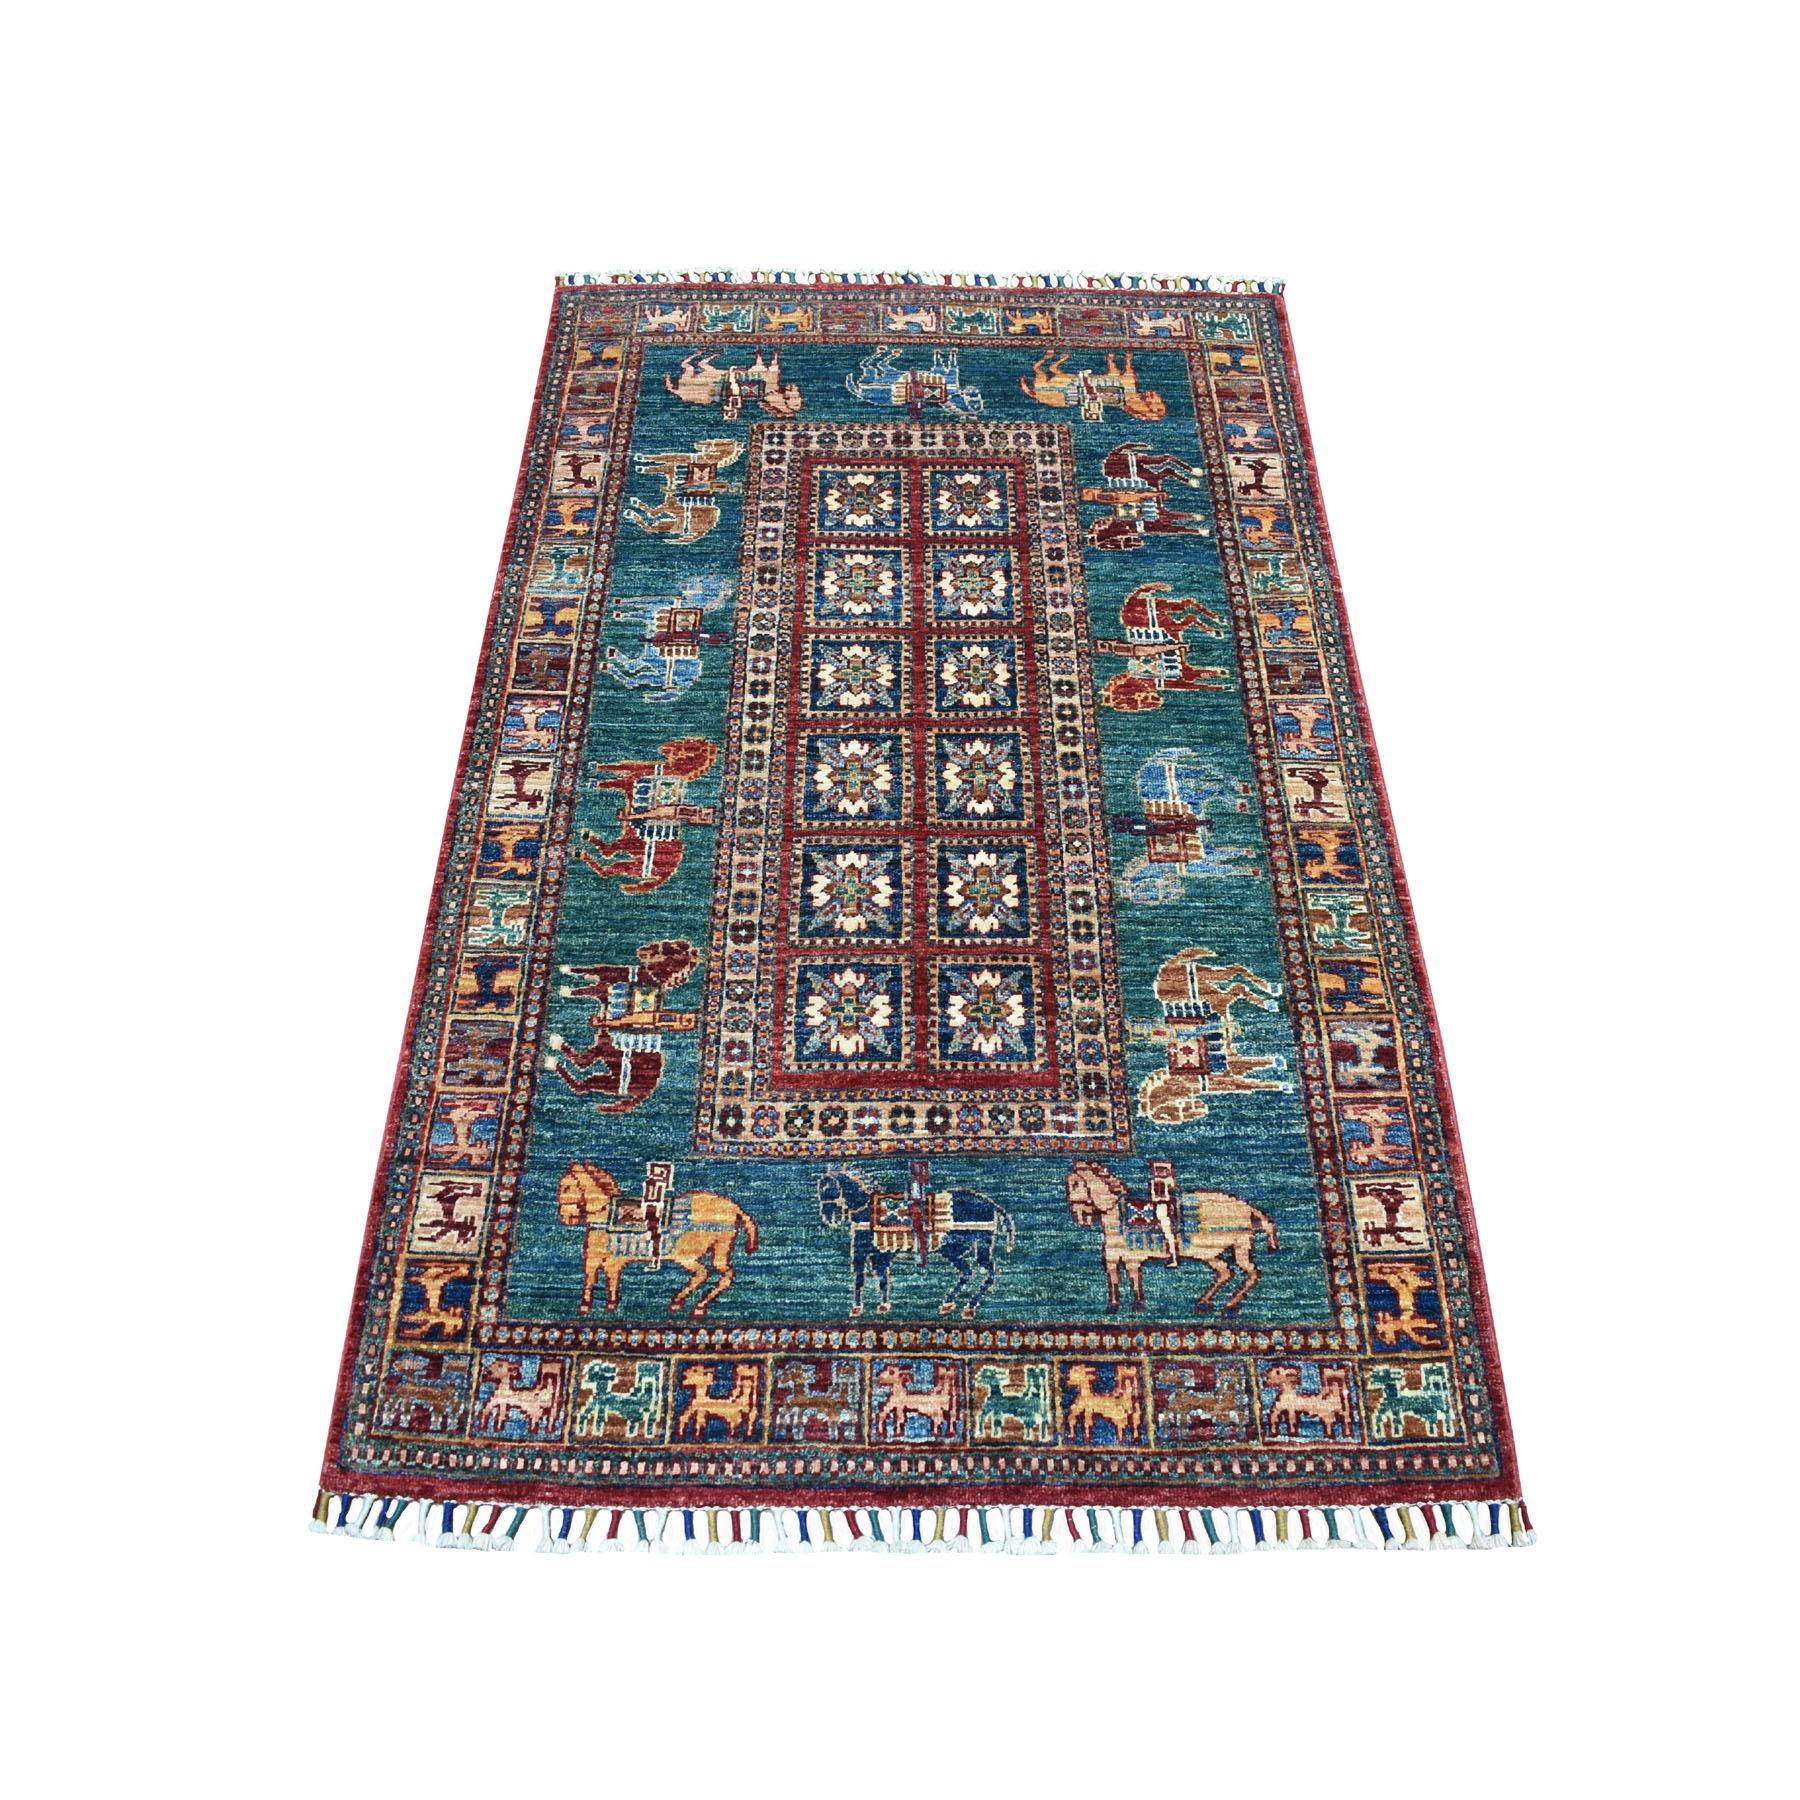 "3'3""x5' Teal Horse Design Super Kazak Tribal Pure Wool Hand Knotted Oriental Rug 52873"